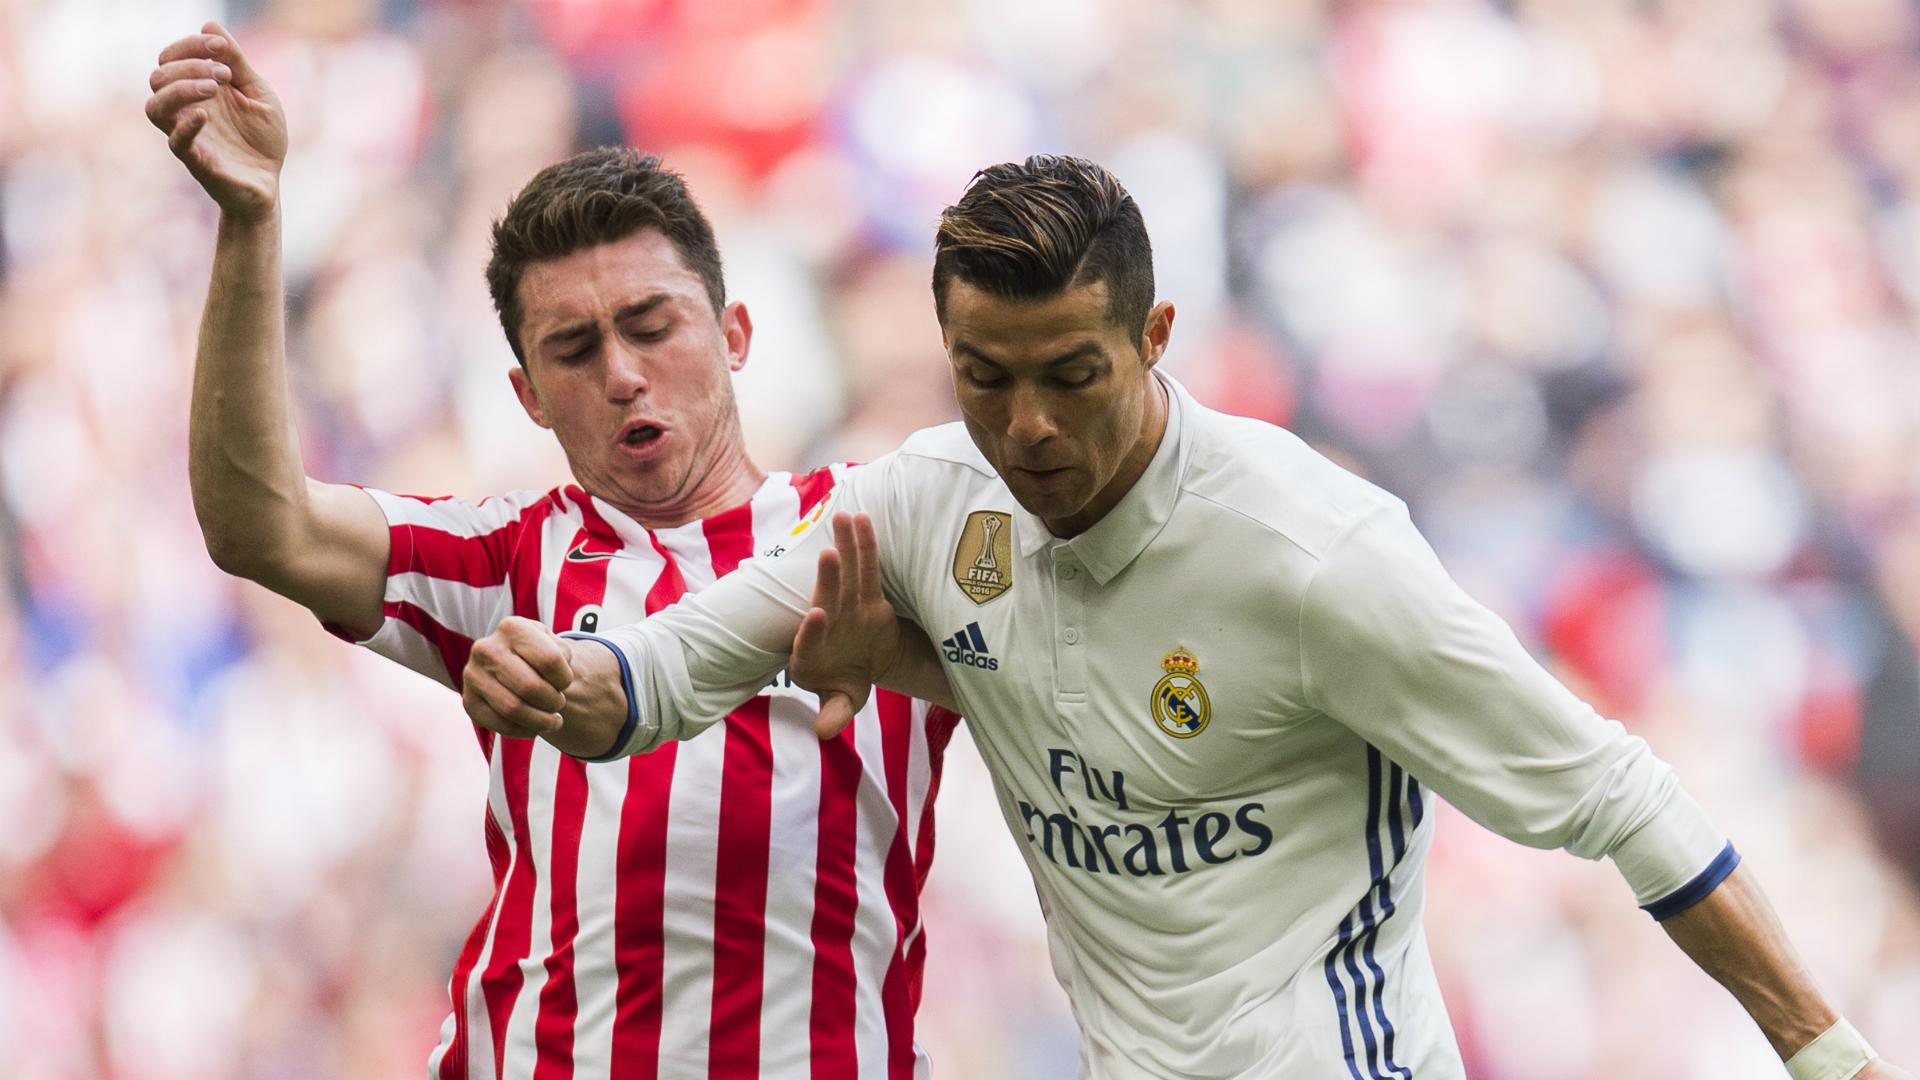 Aymeric Laporte Cristiano Ronaldo Athletic Bilbao Real Madrid La Liga